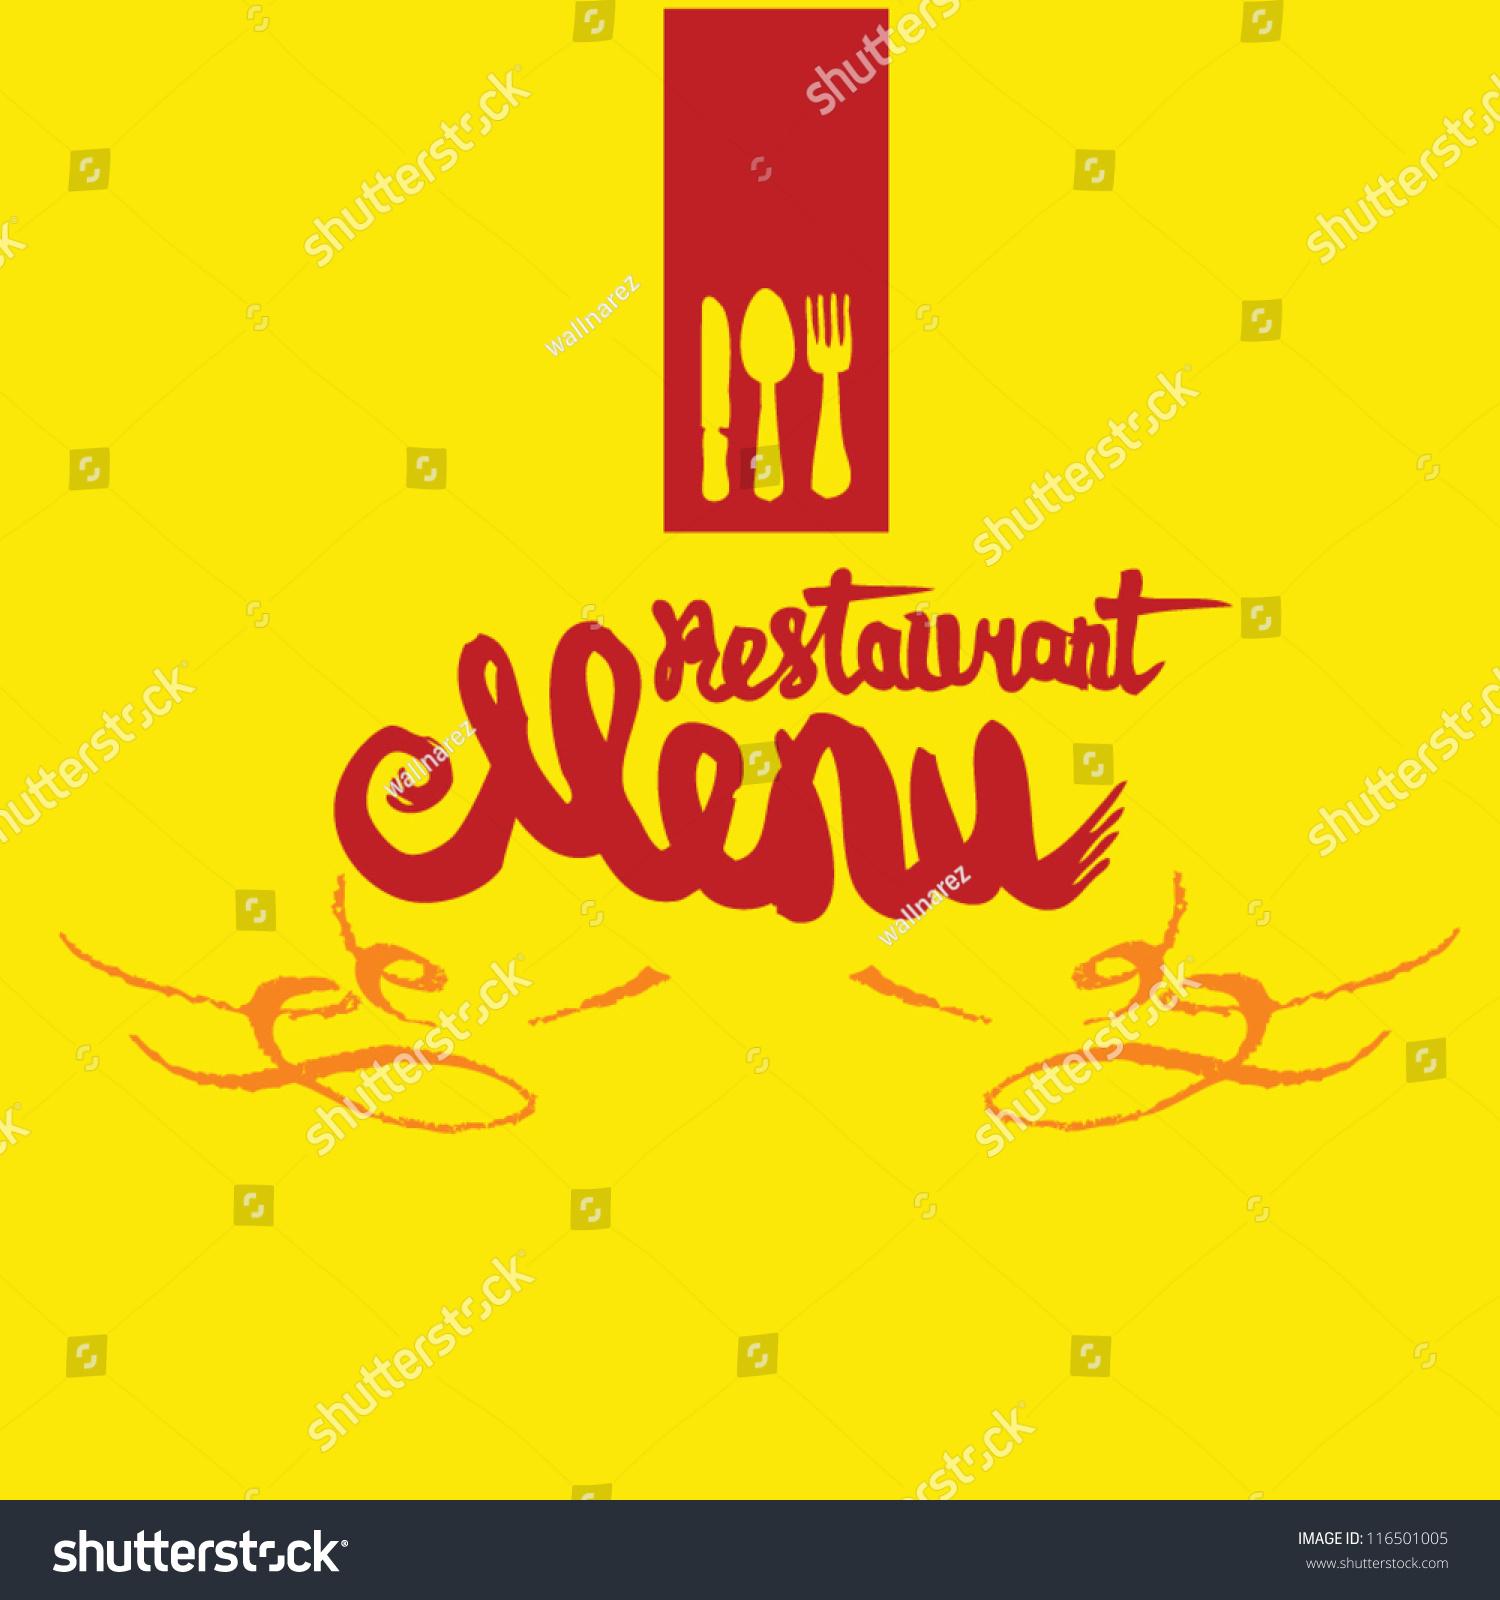 Vector De Stock Libre De Regalias Sobre Restaurant Menu On Yellow Background116501005